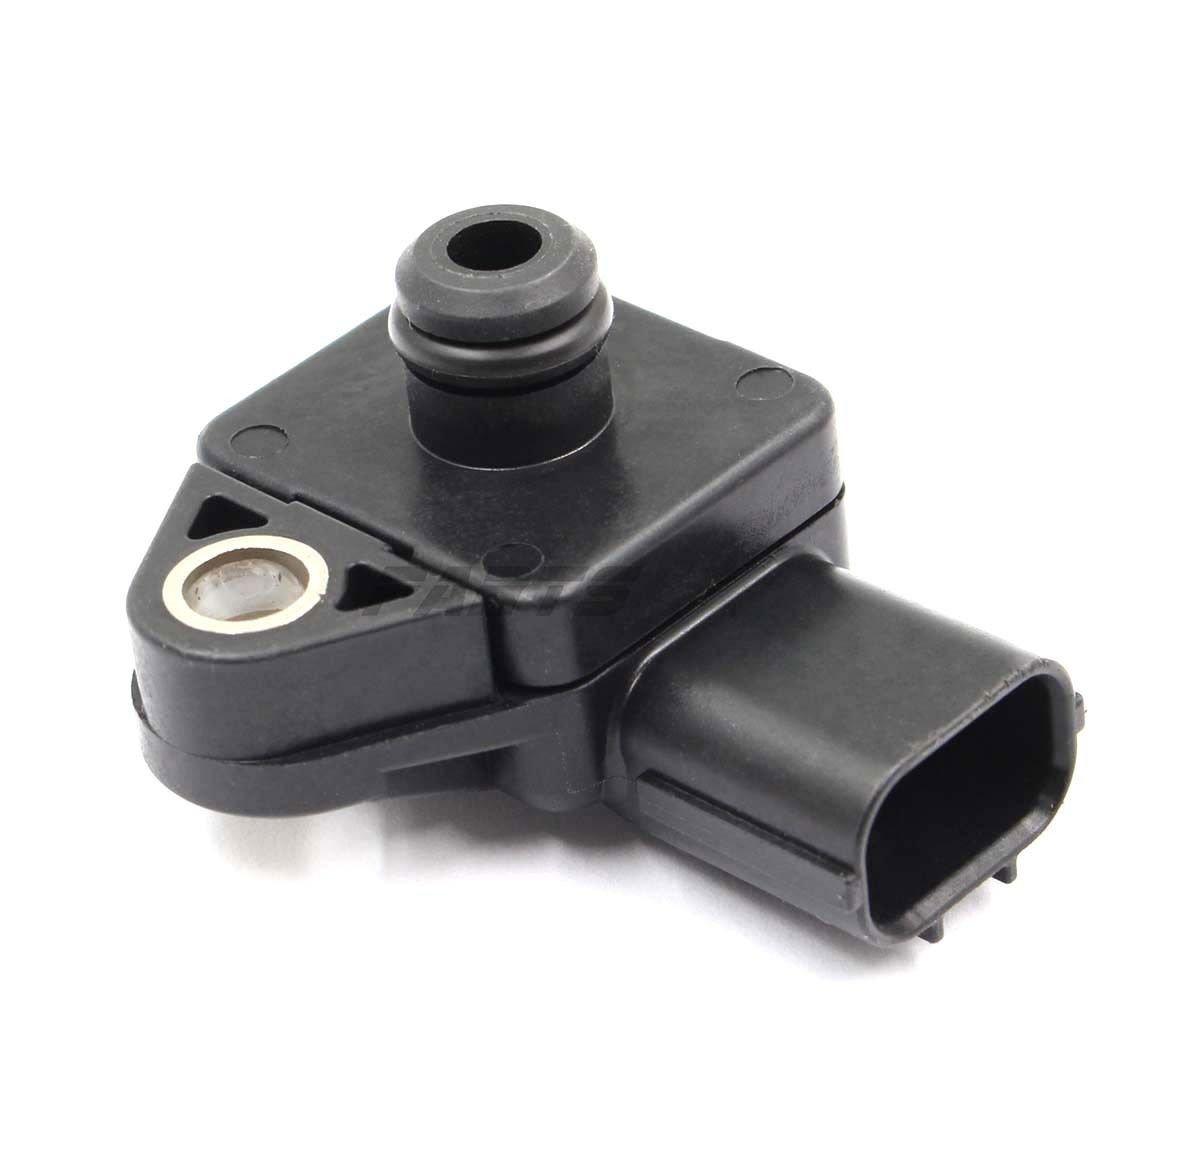 OEM Genuine Denso MAP Sensor 37830-PGK-A01 For Honda Acura Civic Accord CRV